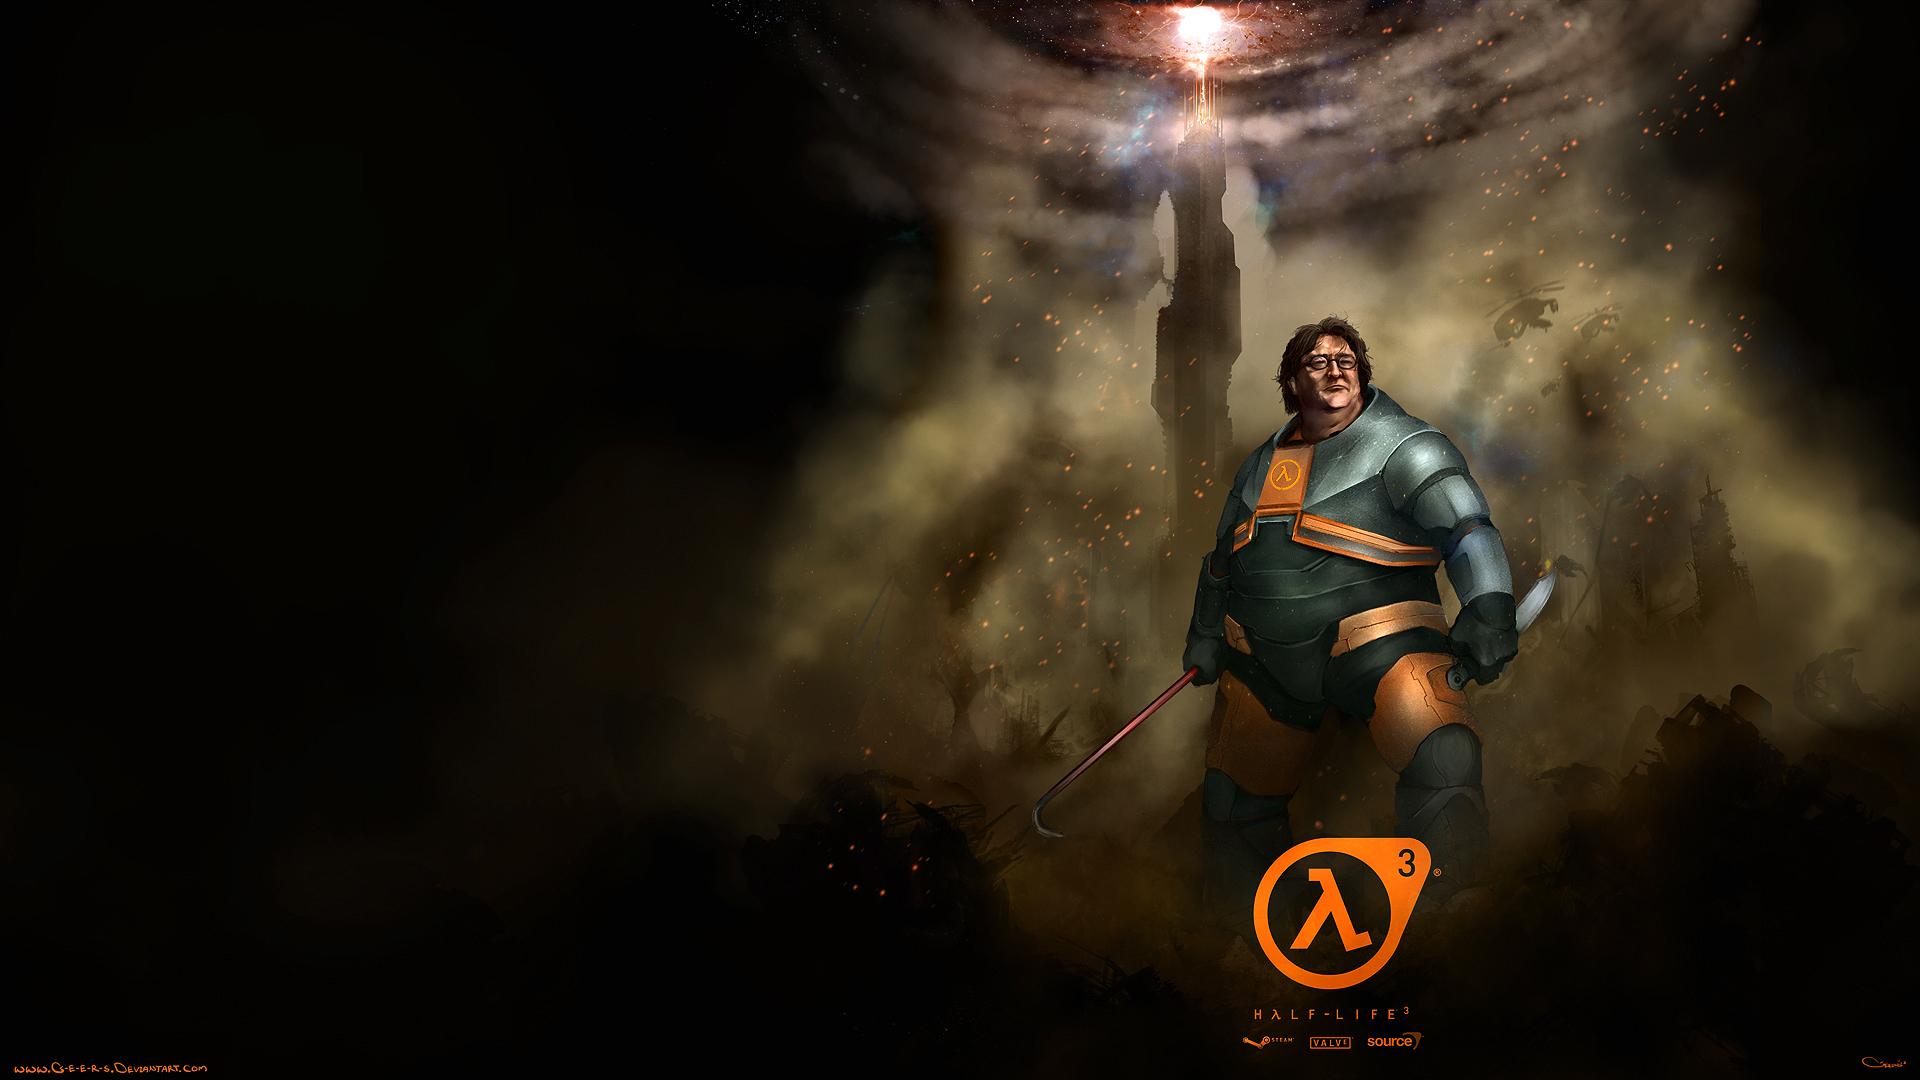 Free Download Life 3 Gabe Newell Gaben Half Life 3 Half Life Hl3